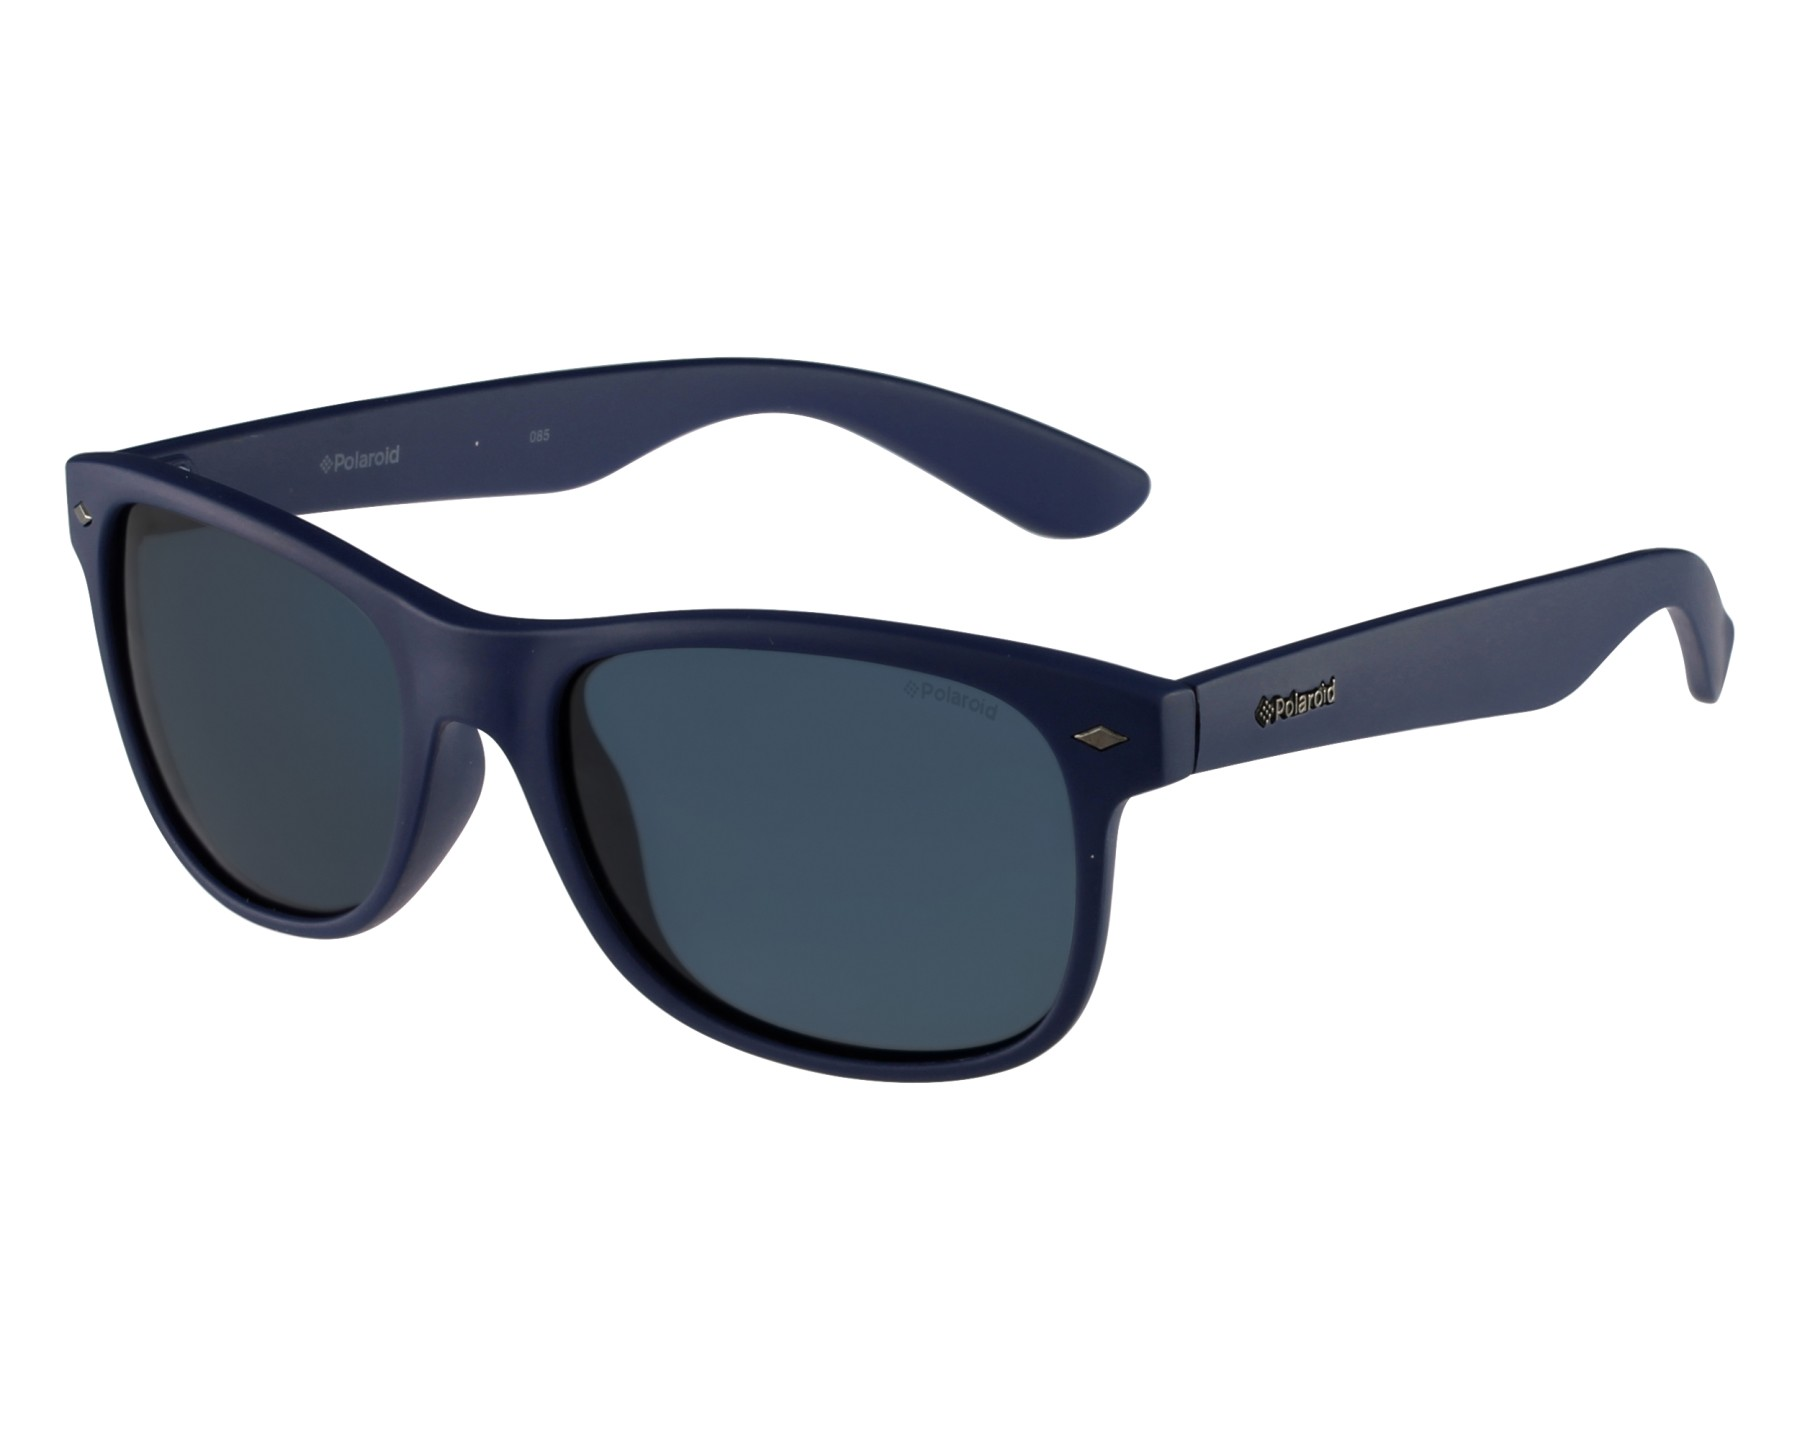 545f876e39 thumbnail Sunglasses Polaroid PLD-1015-S X03/C3 - Blue front view